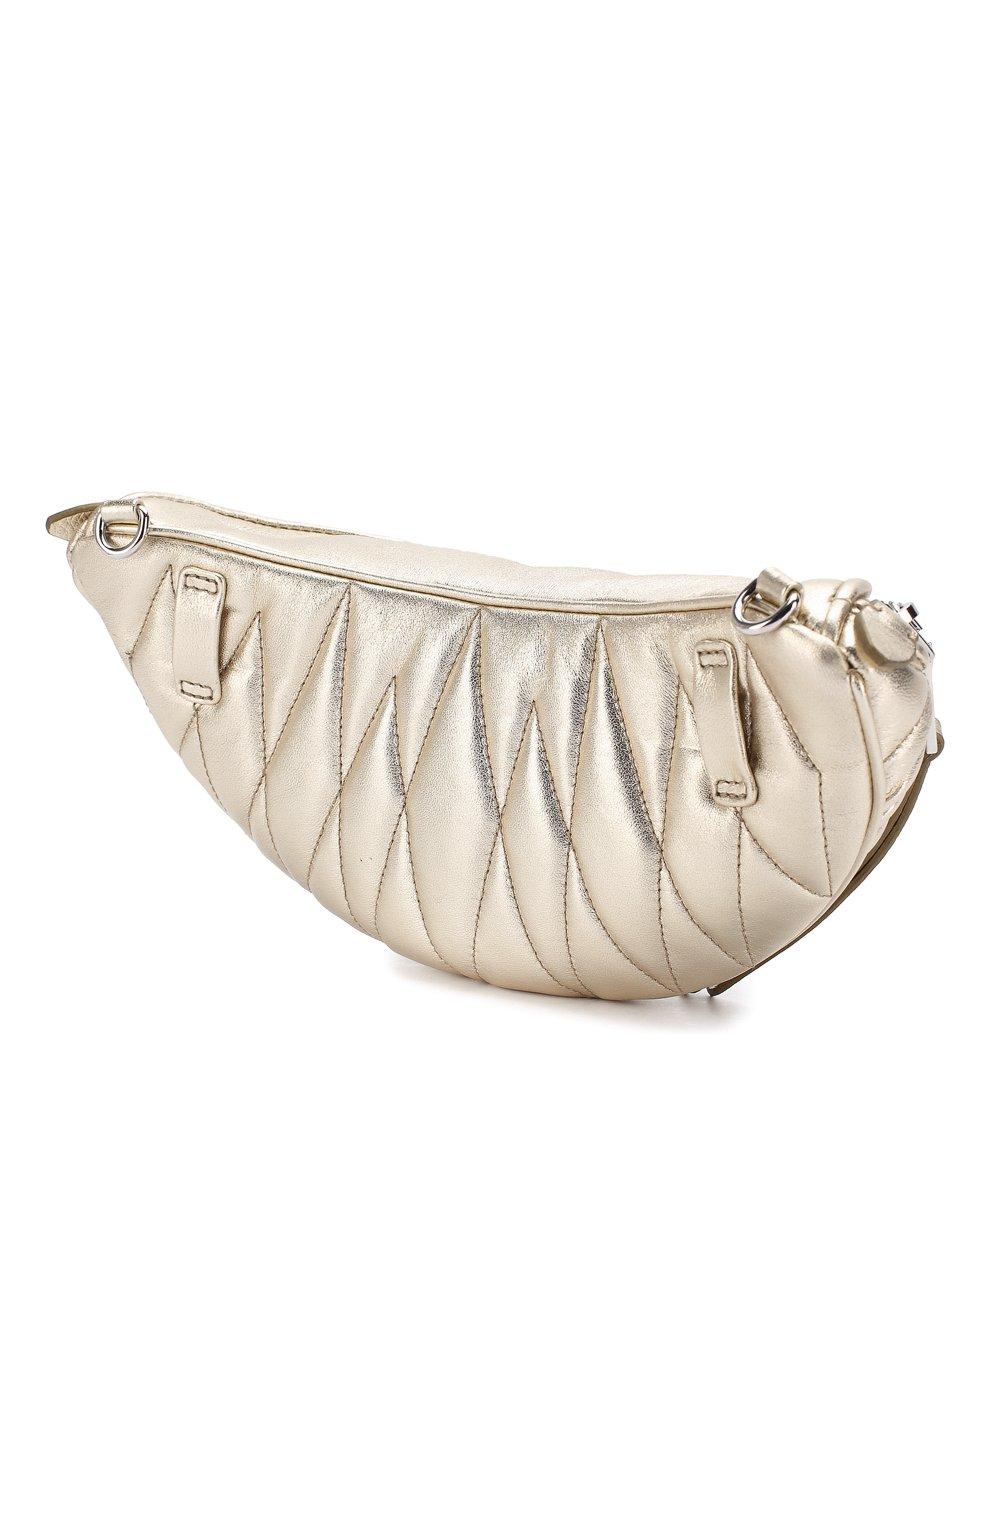 Женская поясная сумка  MIU MIU серебряного цвета, арт. 5BL010-N88-F0PLI-OOO | Фото 3